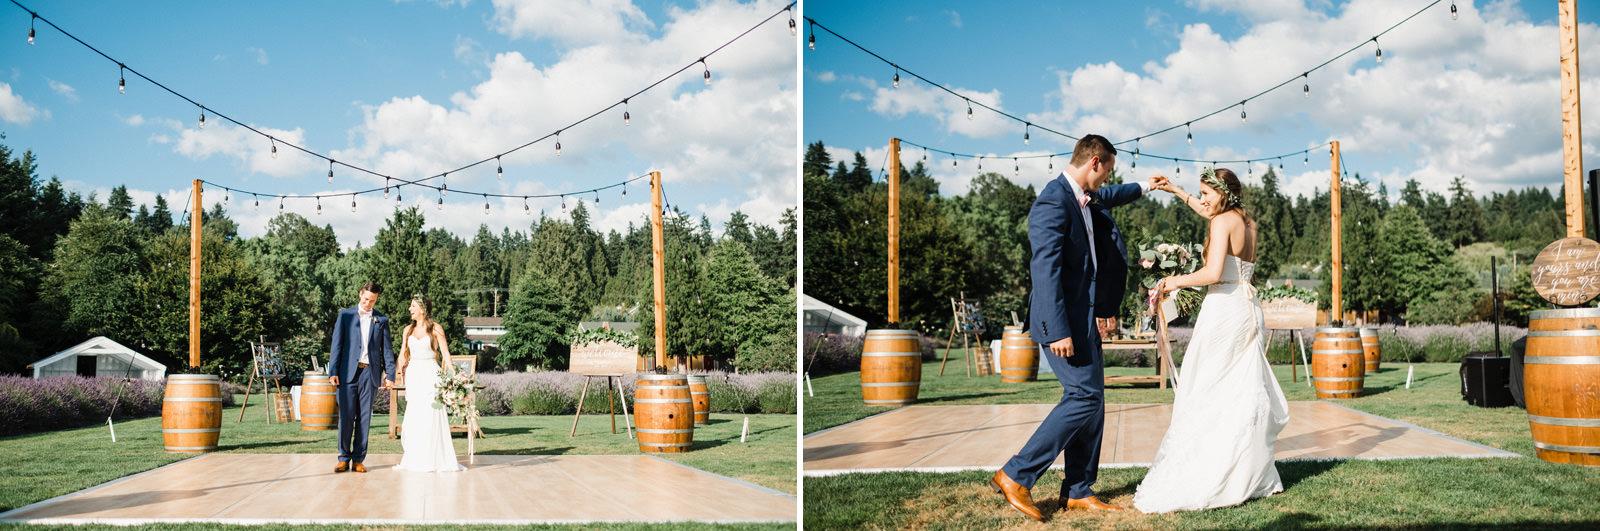 058-woodinville-lavendar-farm-wedding-with-golden-glowy-photos.jpg